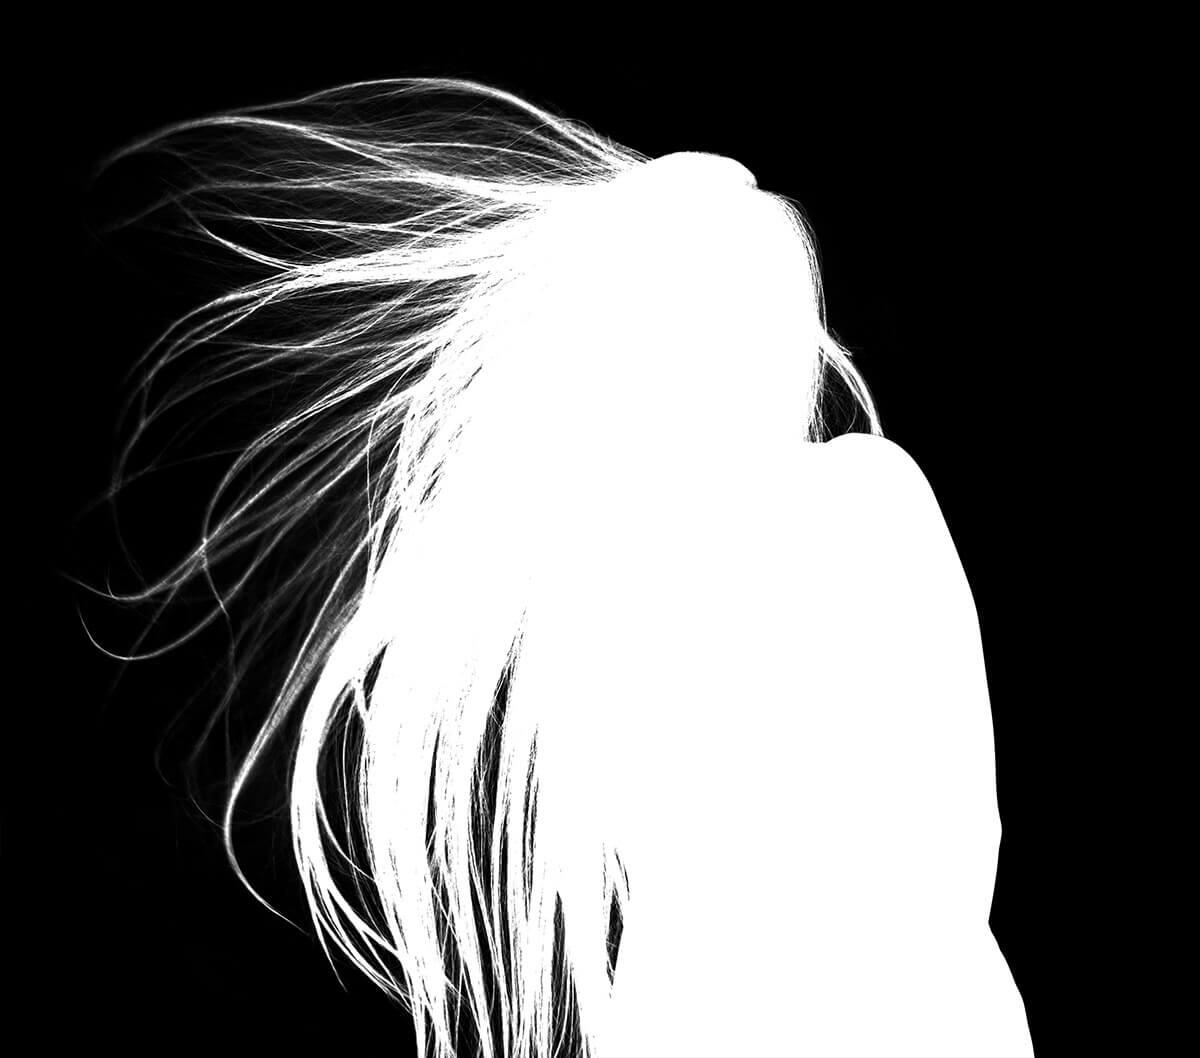 Freistellen Bildbearbeitung Haare Alphamaske